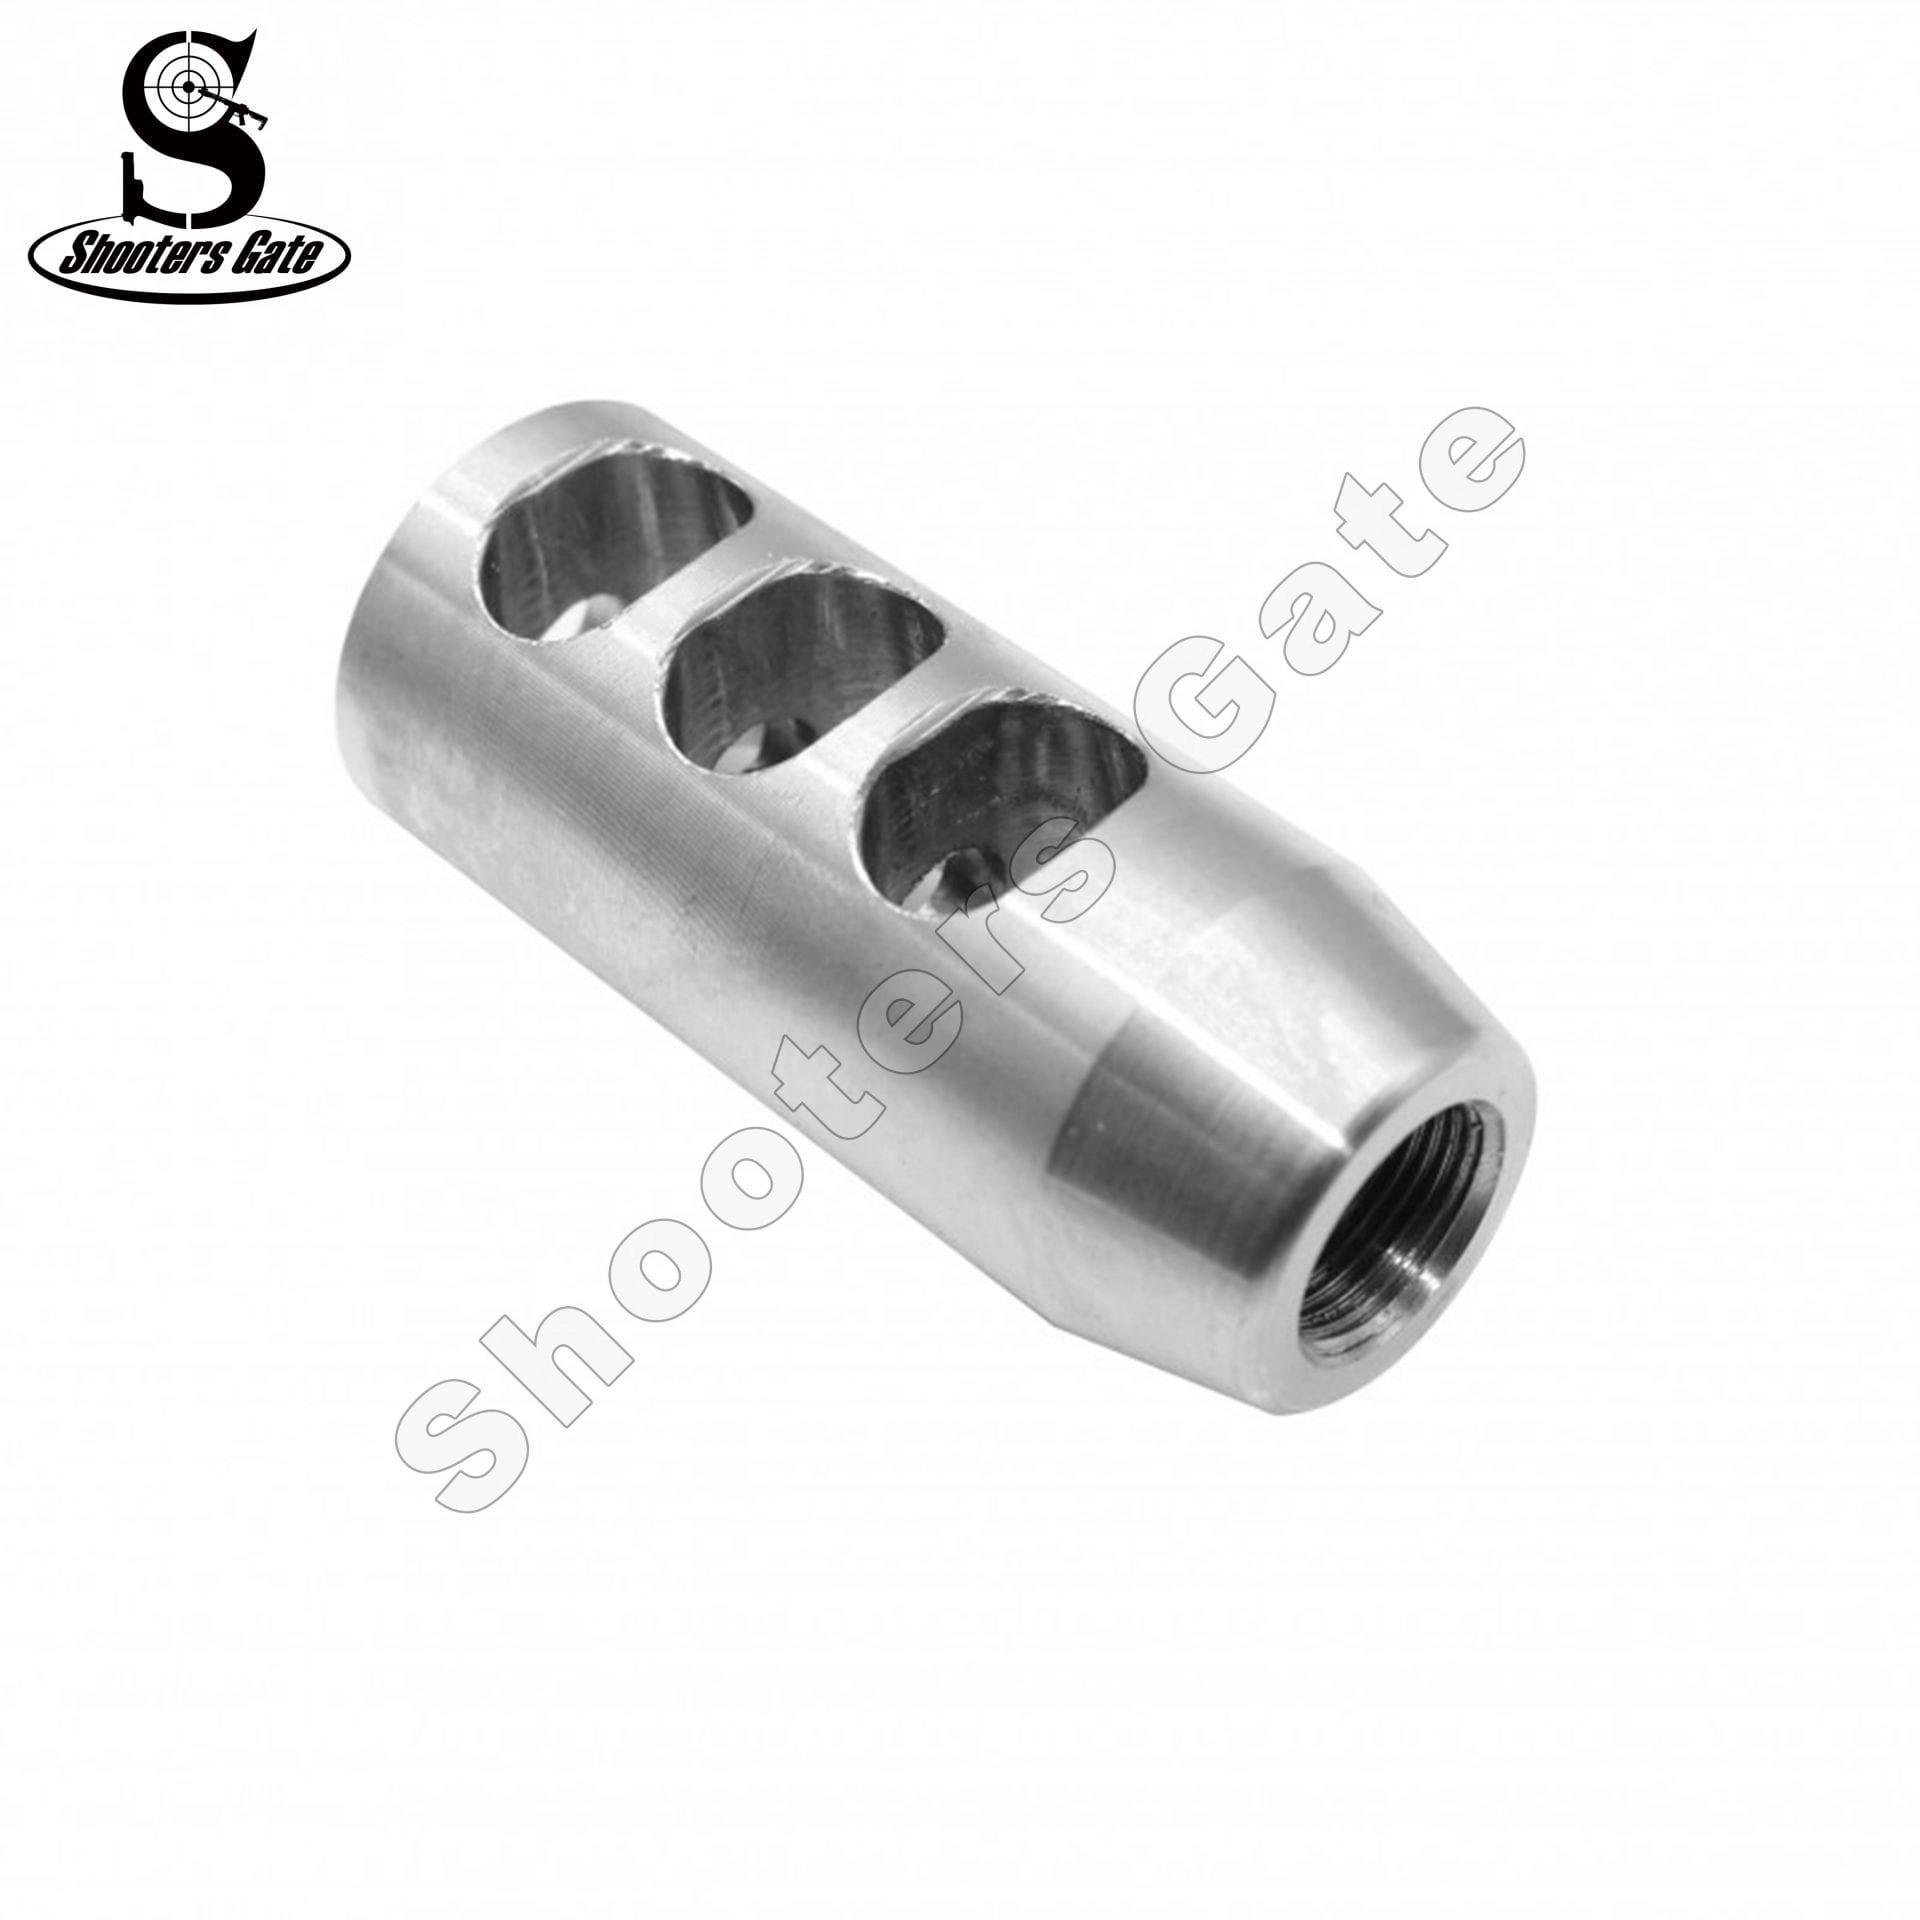 AR15/M4 .223/5.56 Muzzle Break 1/2x28 Thread, S.S.